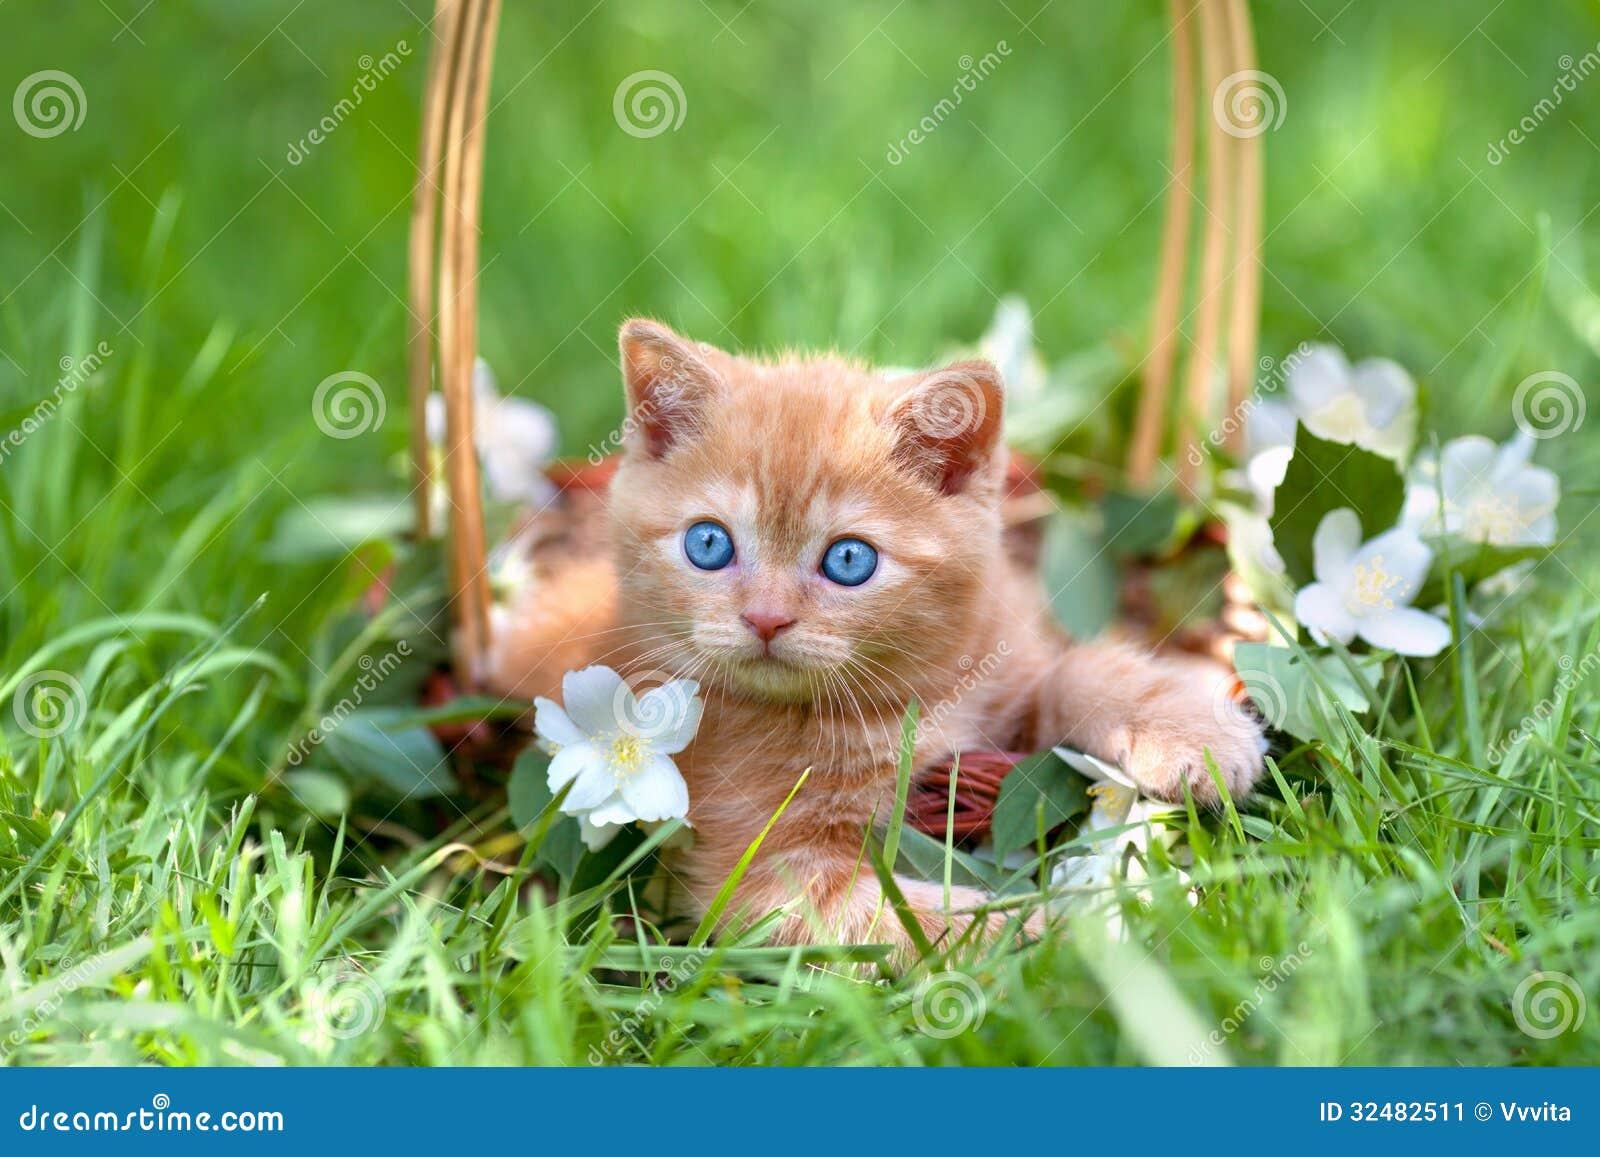 cat lady name